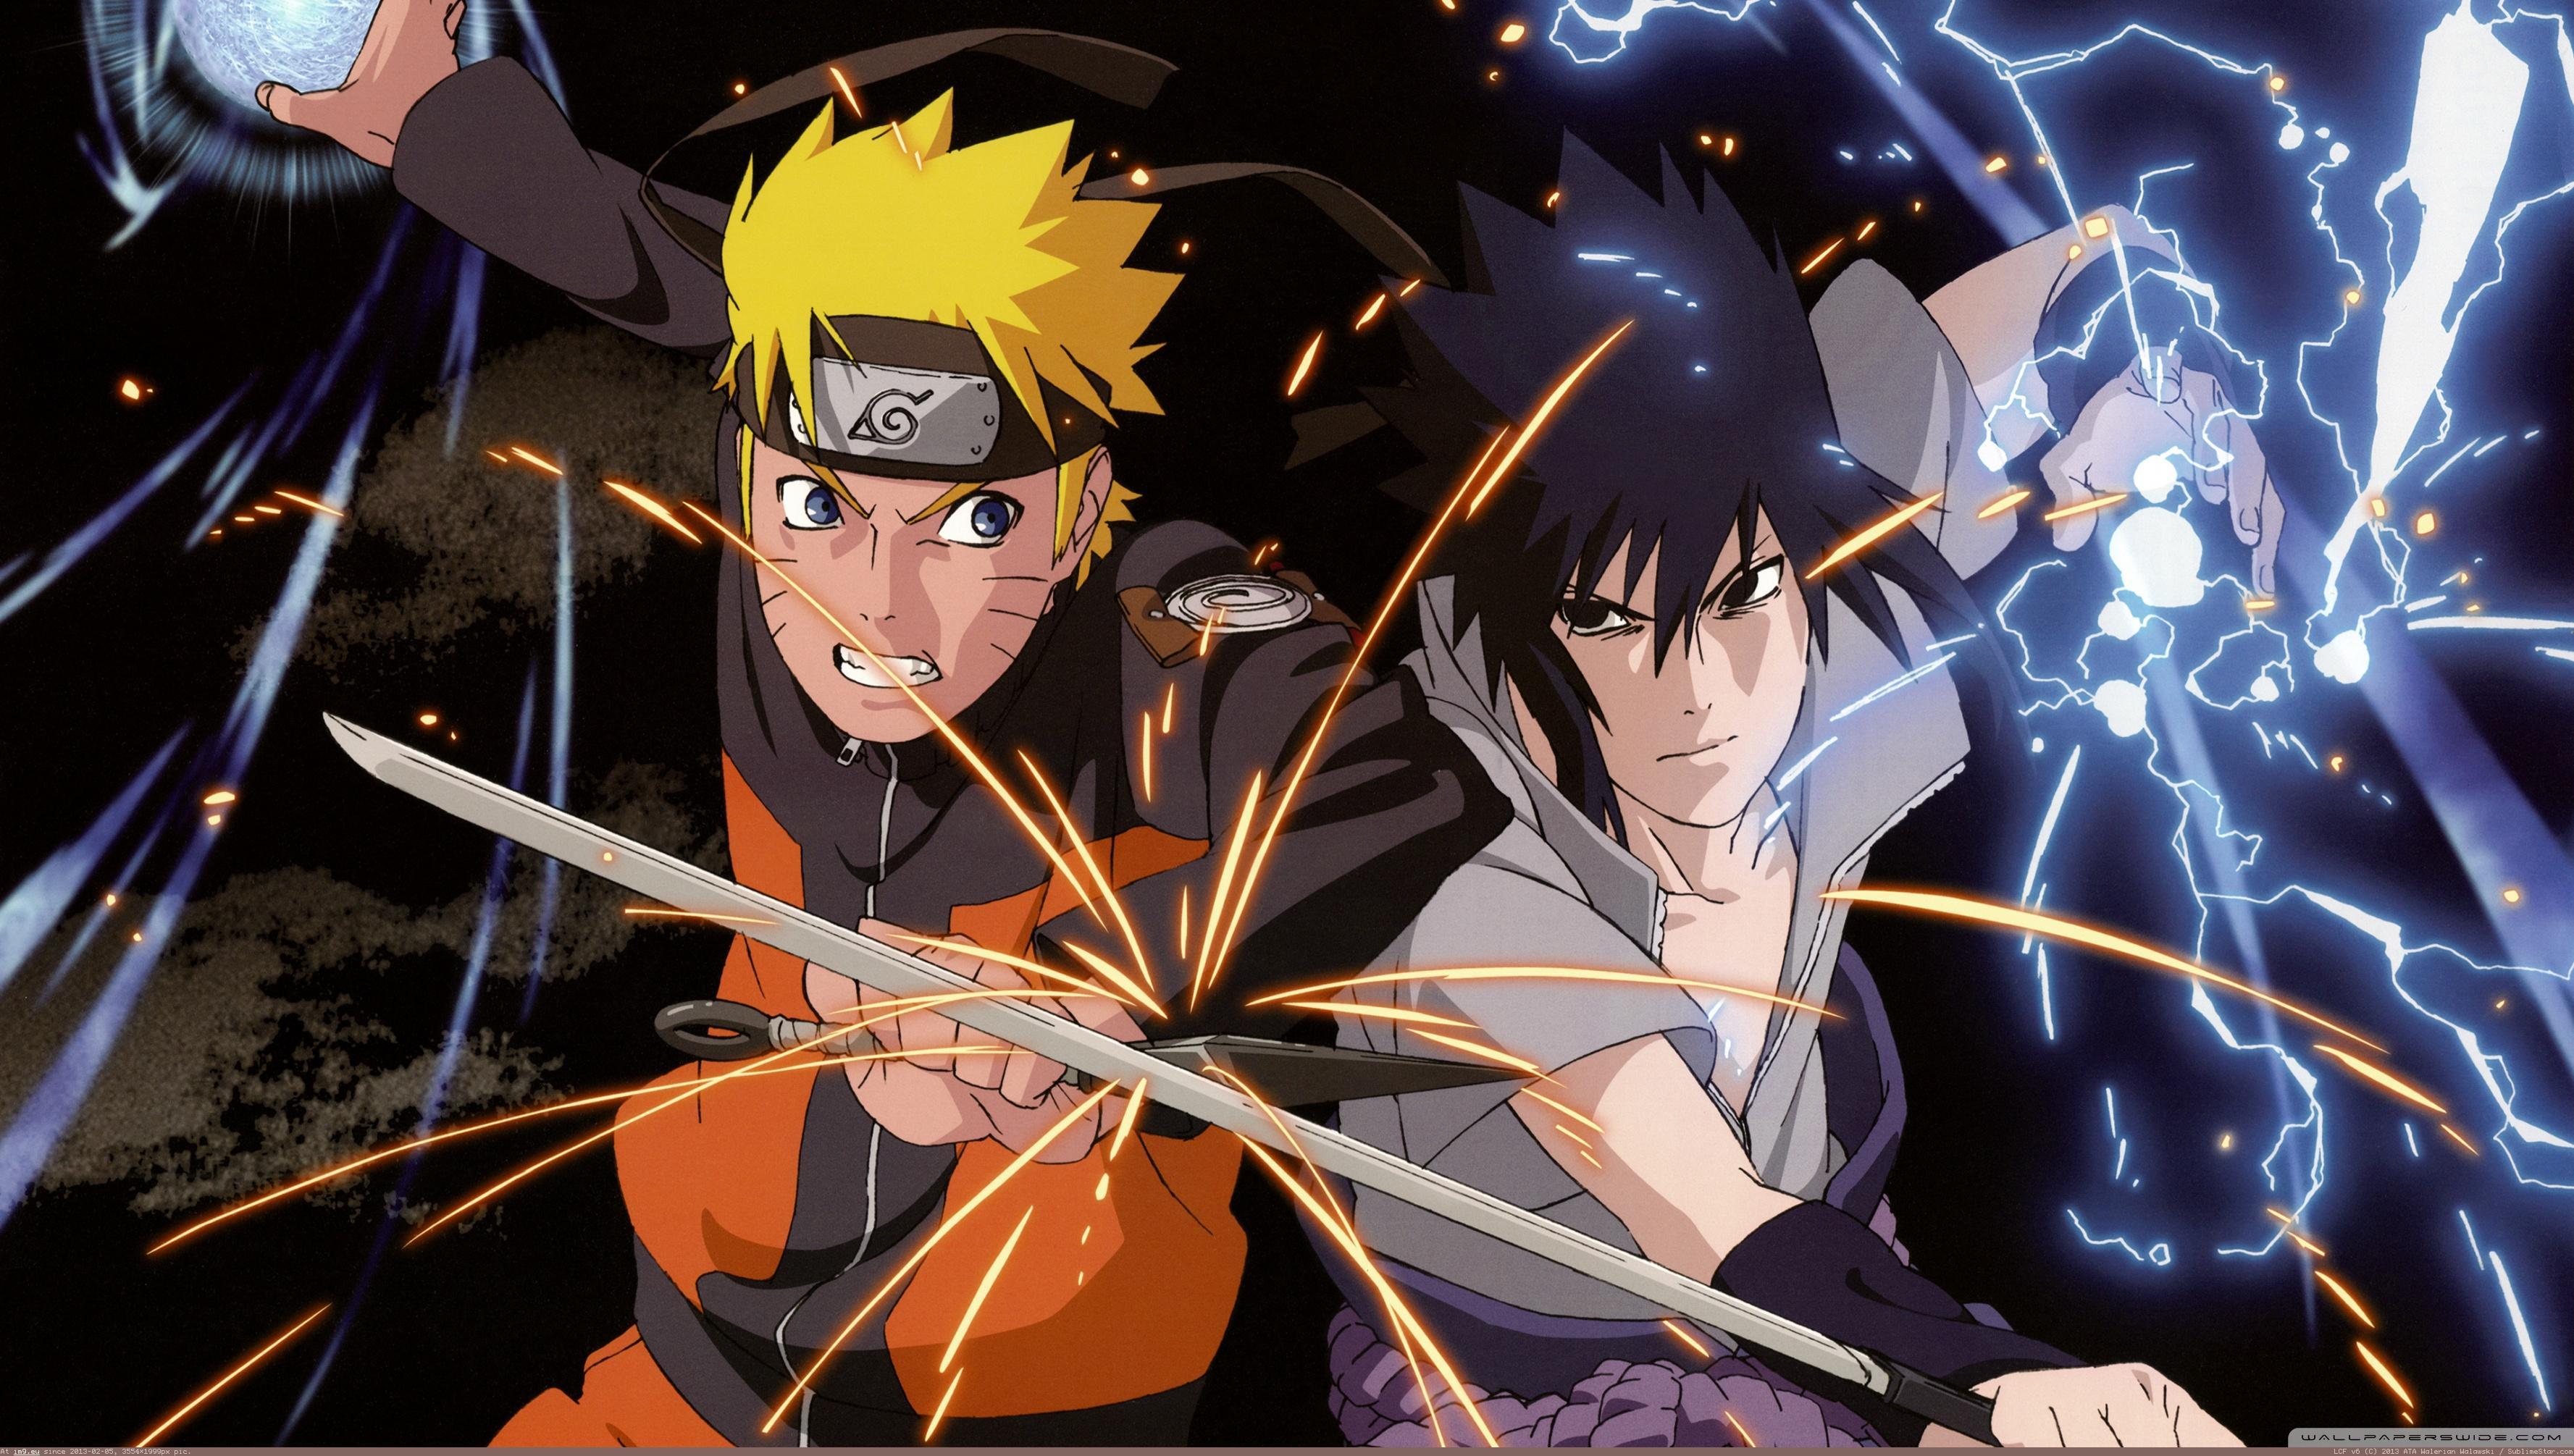 Pics Photos - Naruto Vs Sasuke Wallpaper Naruto Anime ...